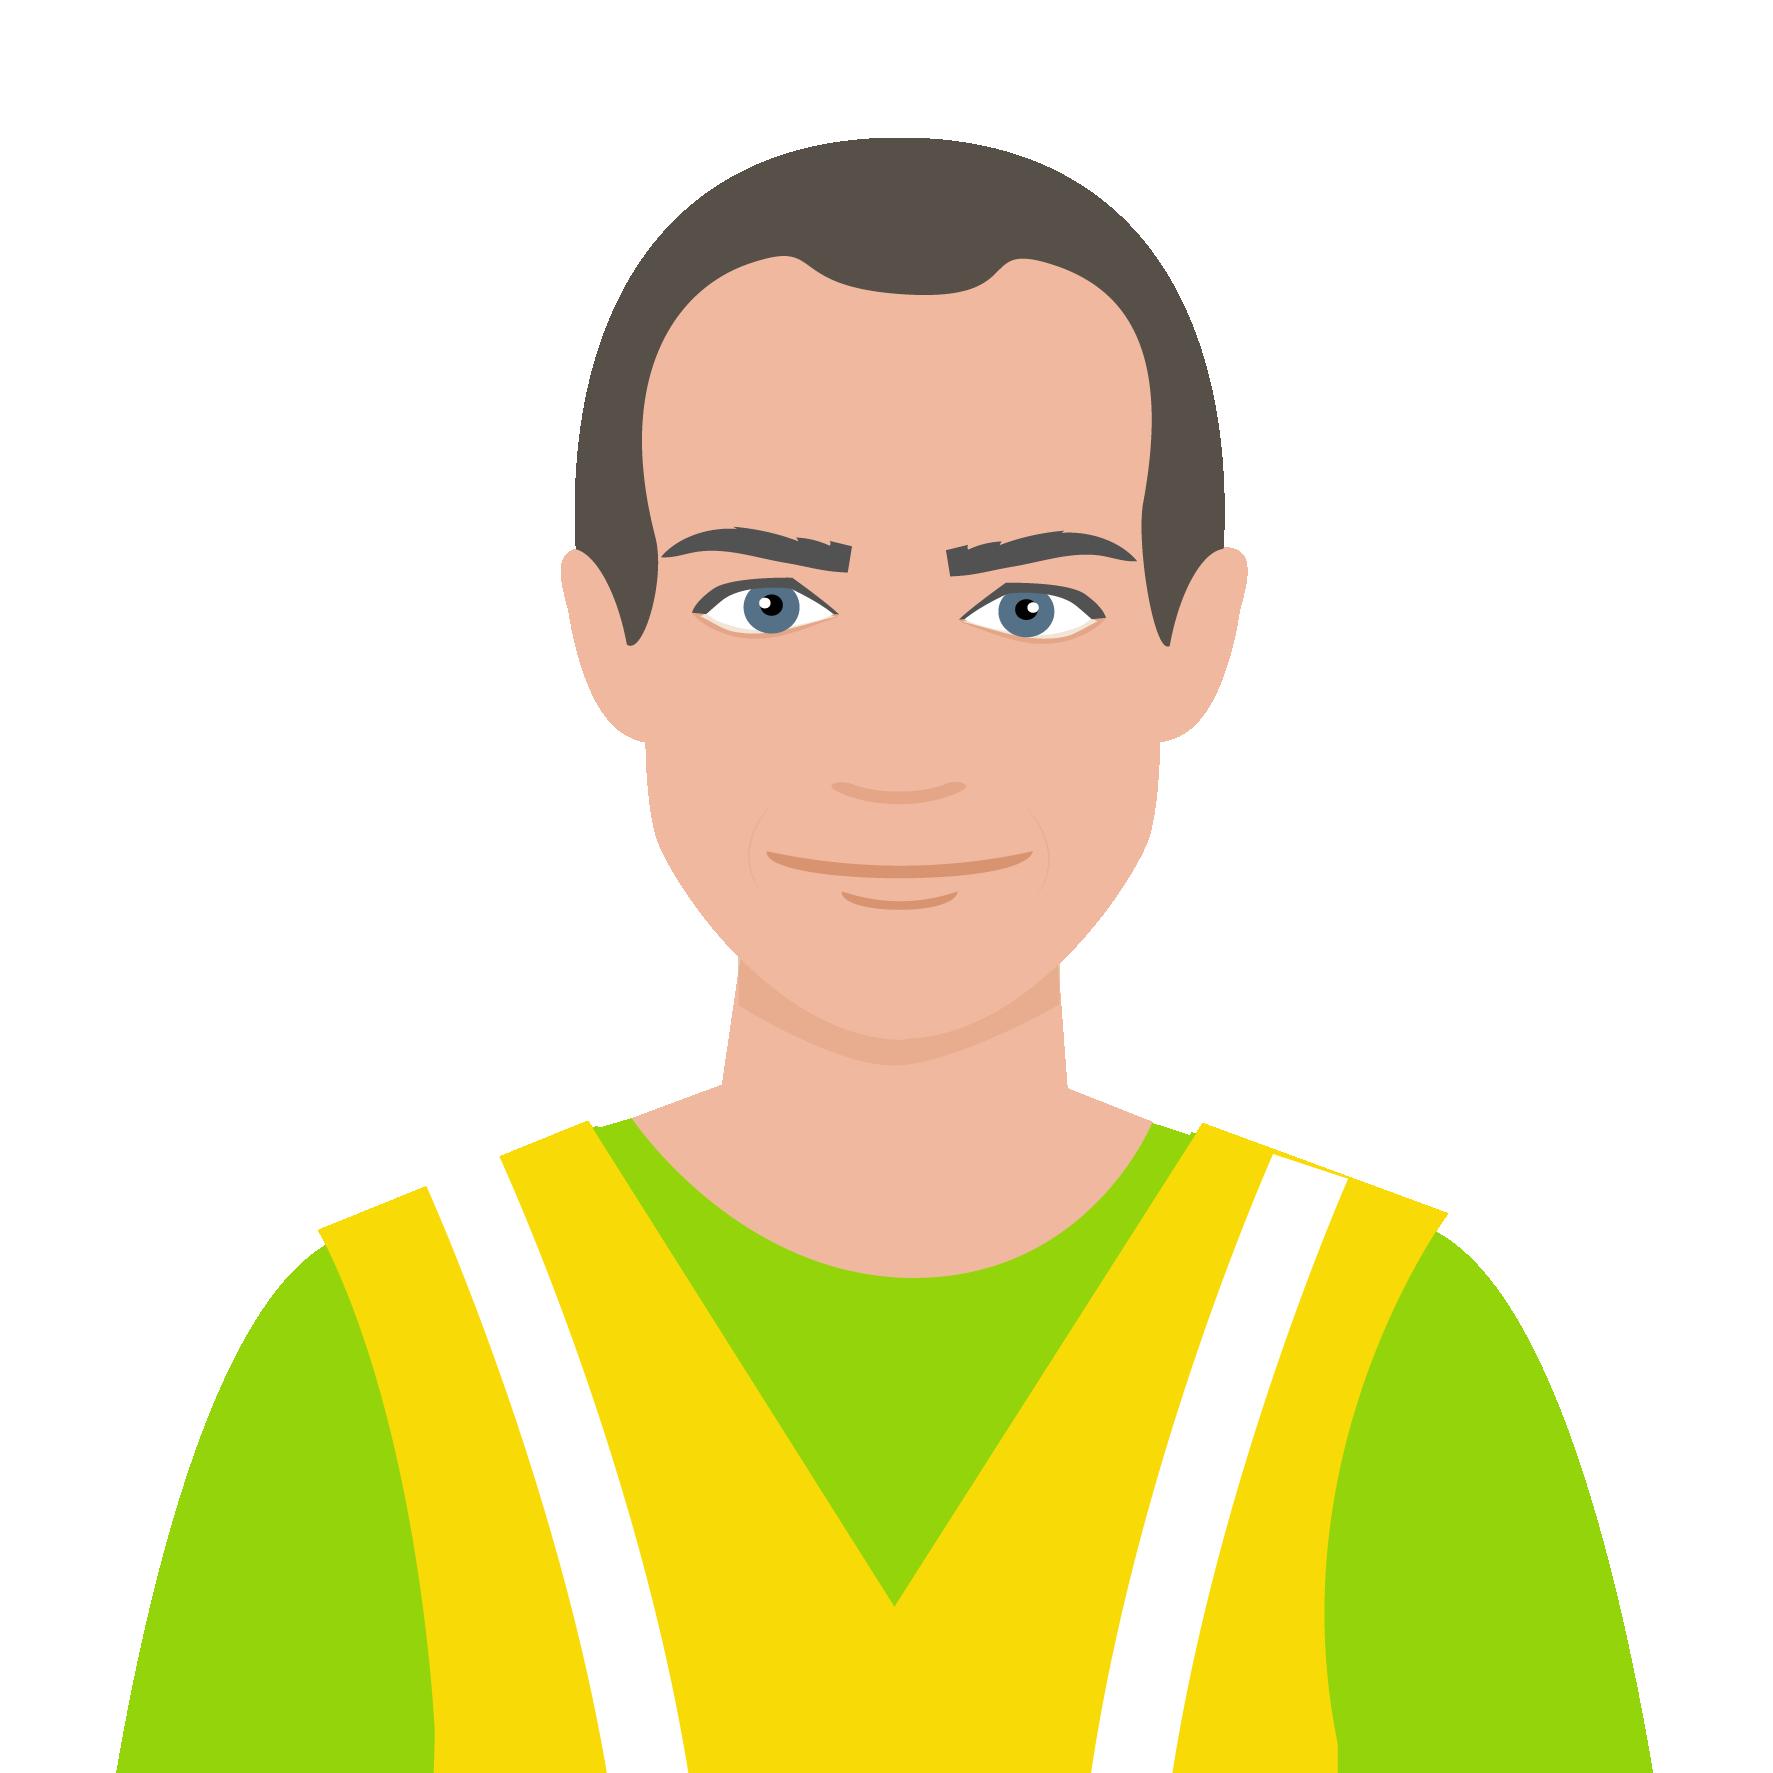 jaquier_habefast_illu_employes-1773x1773-site_Plan de travail 1 copie 6